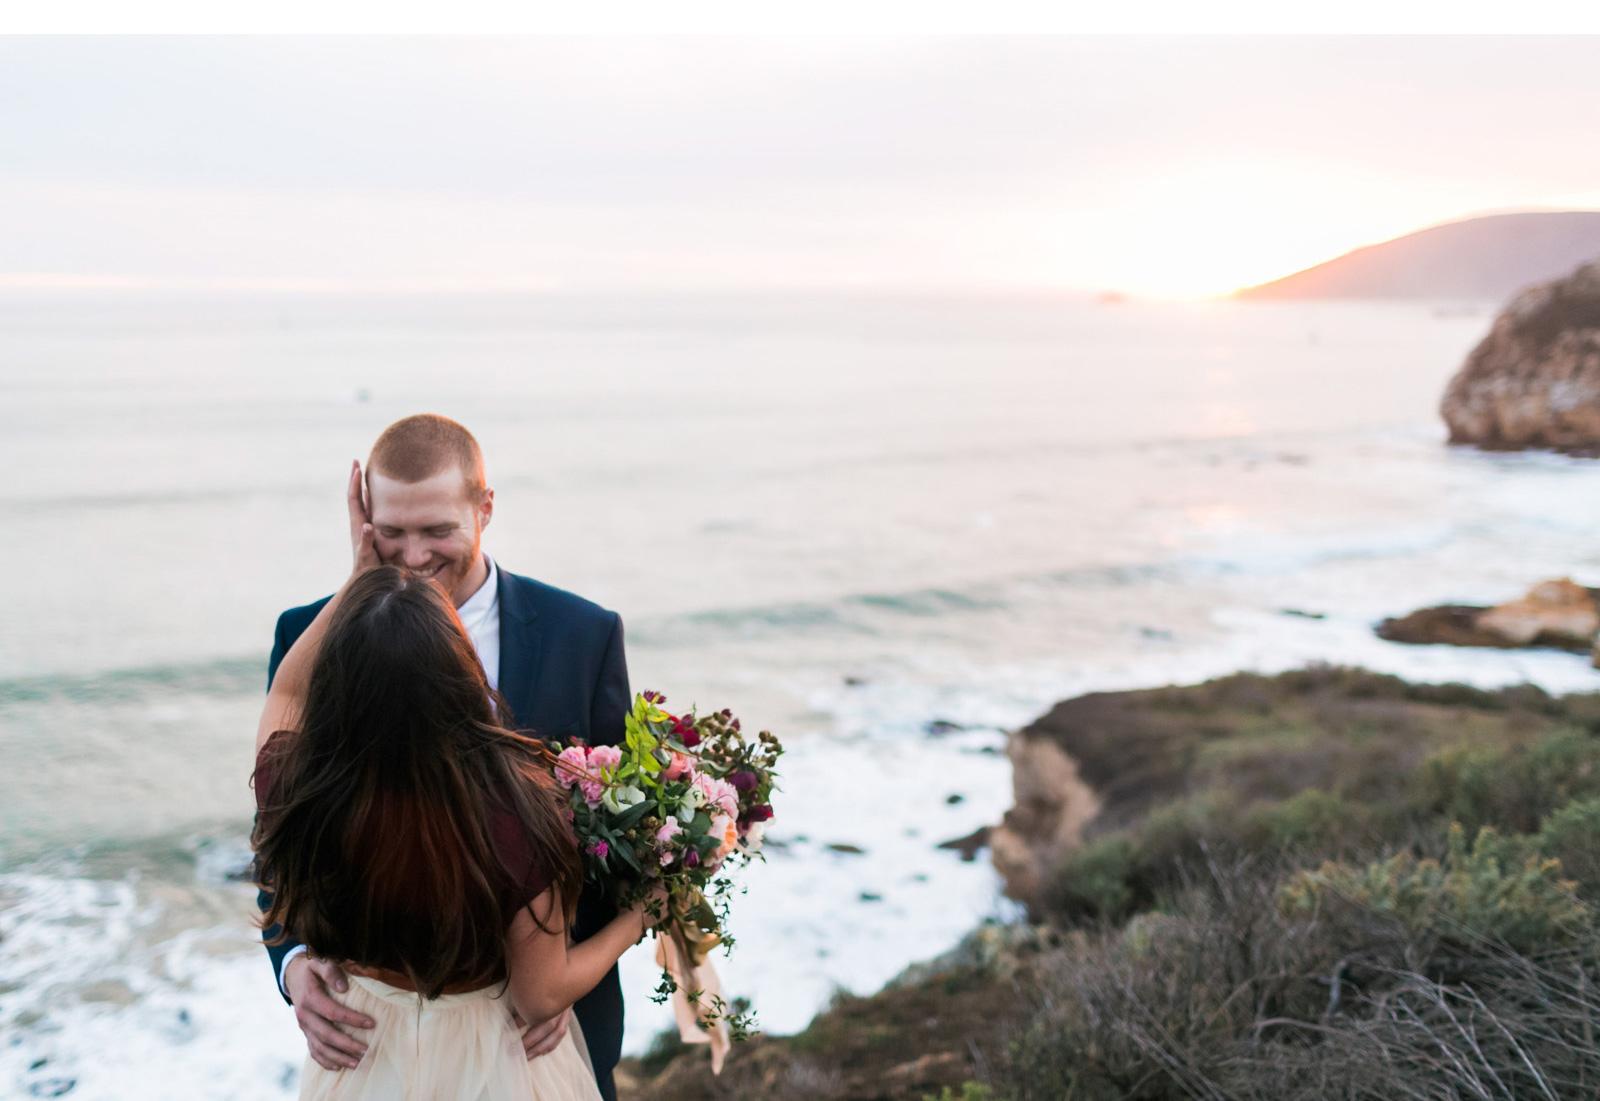 San-Luis-Obispo-Wedding-Photographer-Natalie-Schutt-Photography_08.jpg